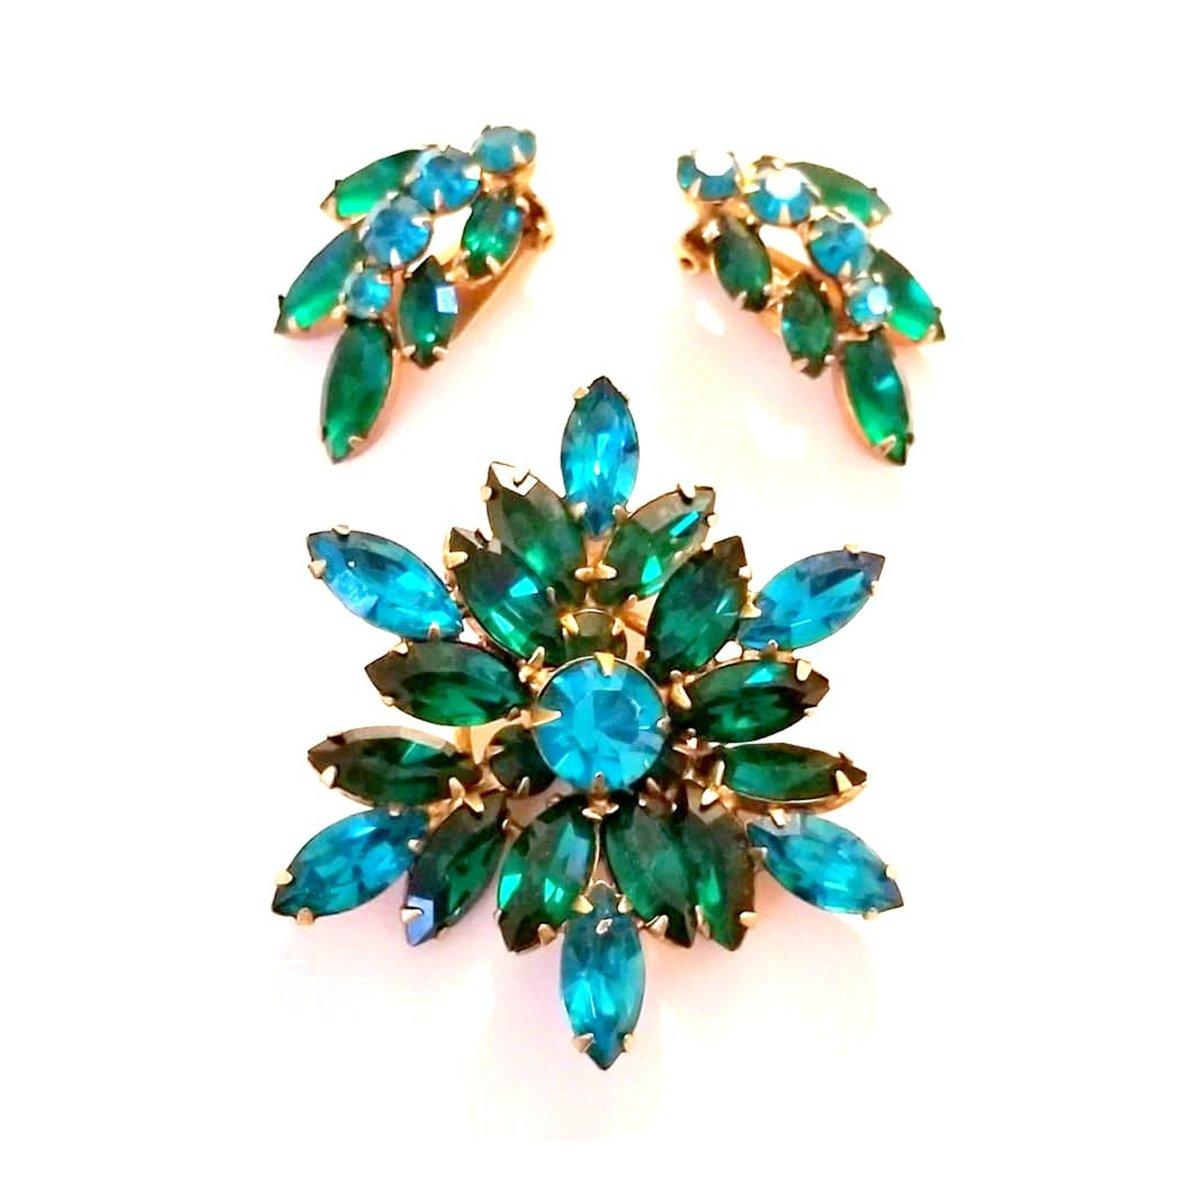 Vintage Designer Peacock Aurora Borealis Brooch and Matching Earrings Signed REGENCY 1960s http://tuppu.net/261404b #Gotvintage #Etsysellsvintage #JunkYardBlonde #VintageCouturepic.twitter.com/Mqe2Jx5pWX